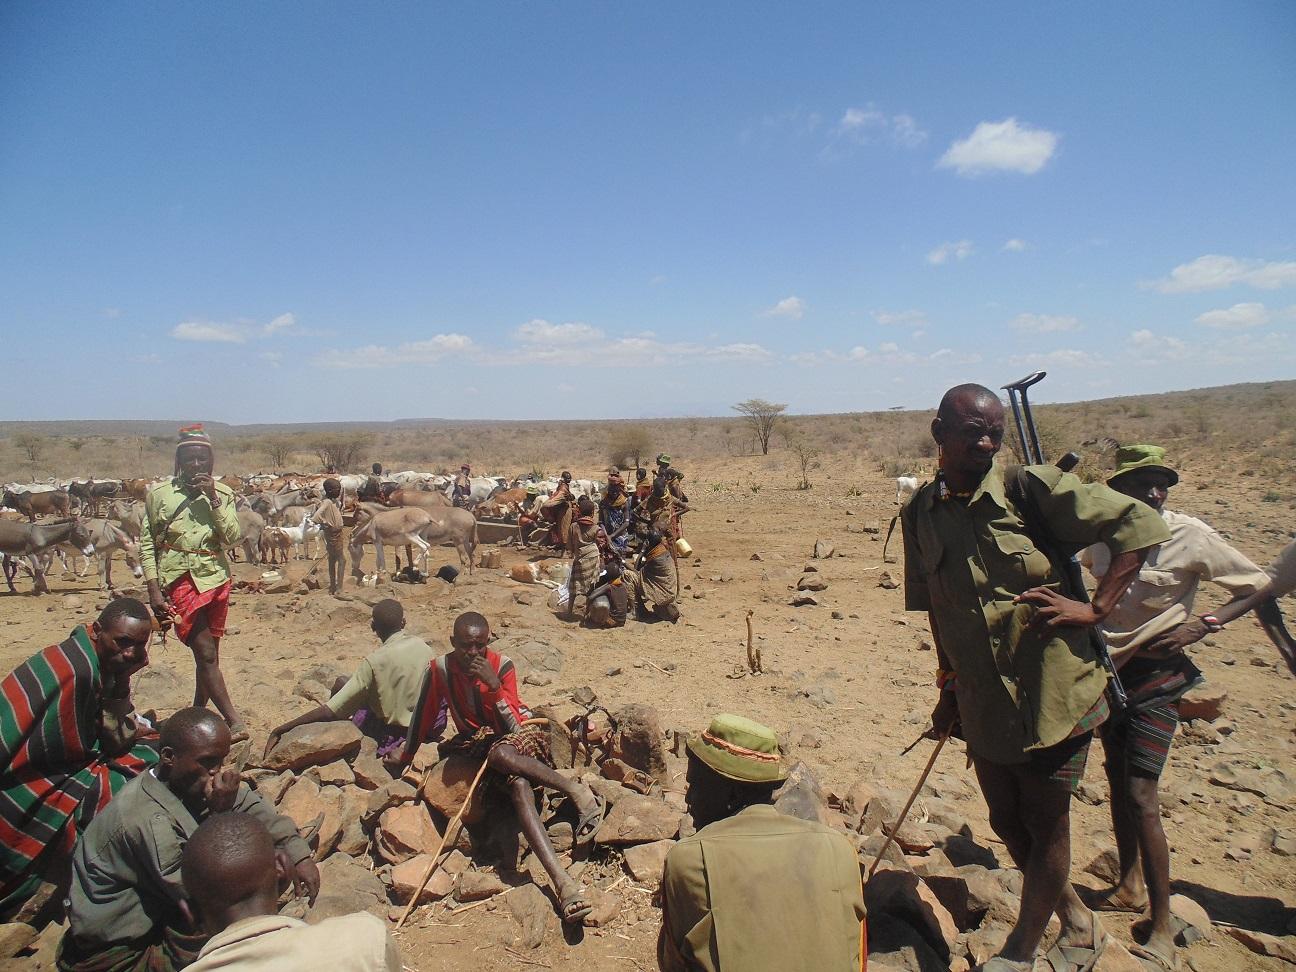 Cattle Raids in Northern Kenya